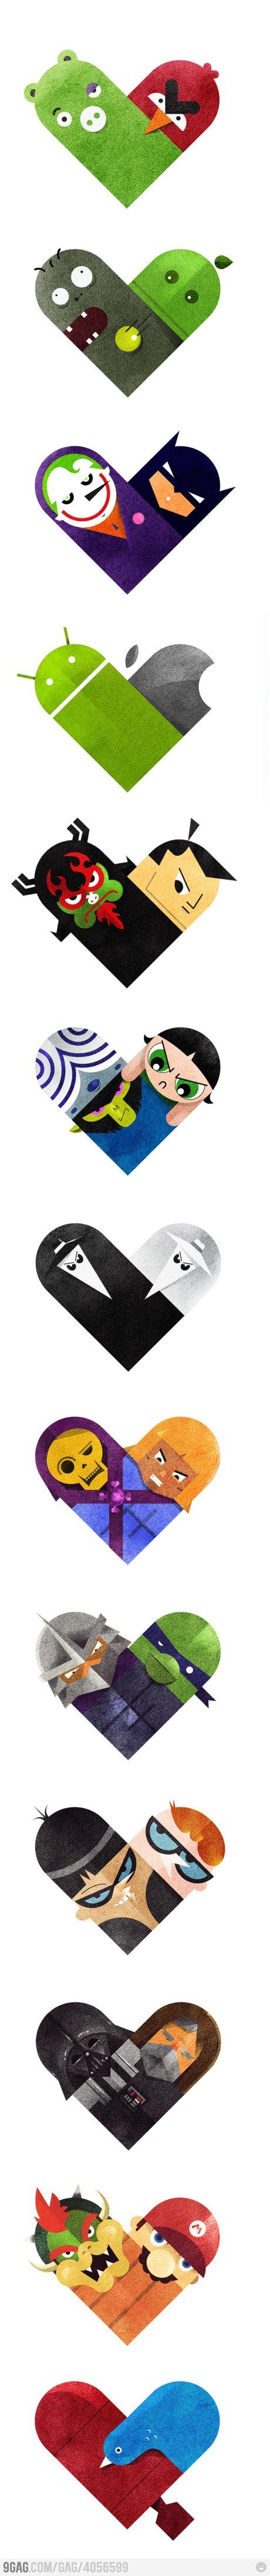 Love and hate vs hearts